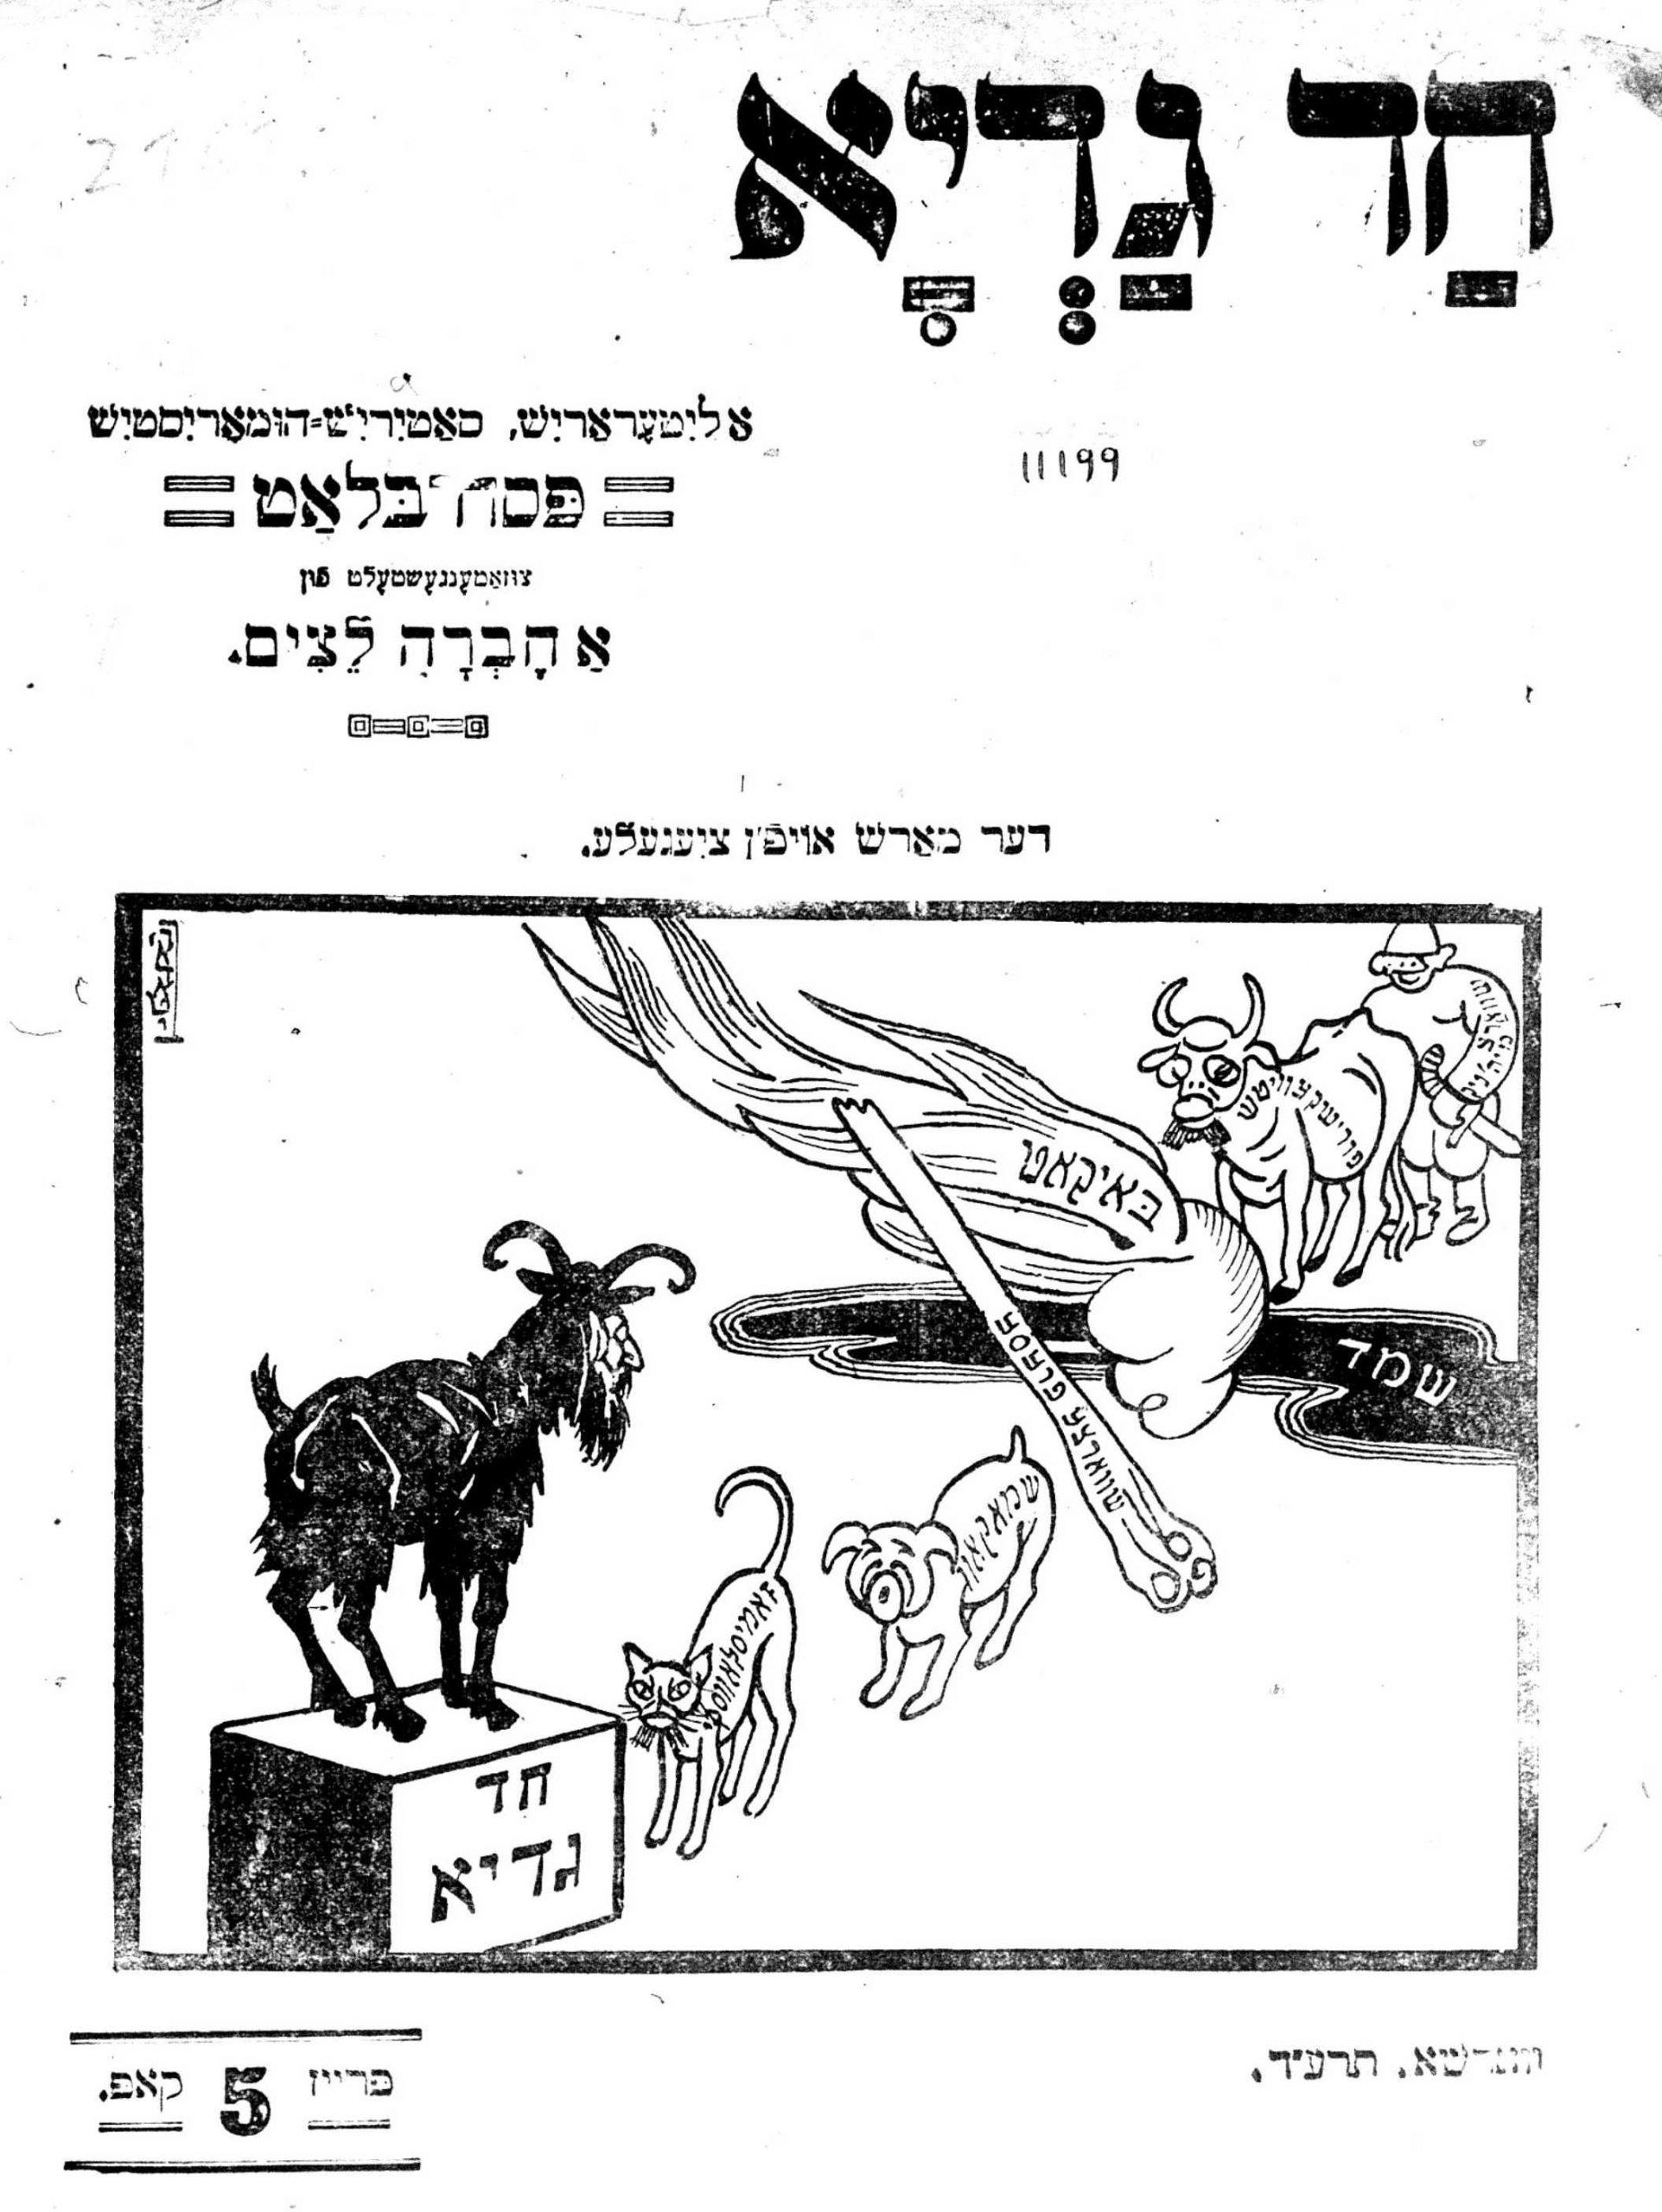 Satirical khad gadye, 1914